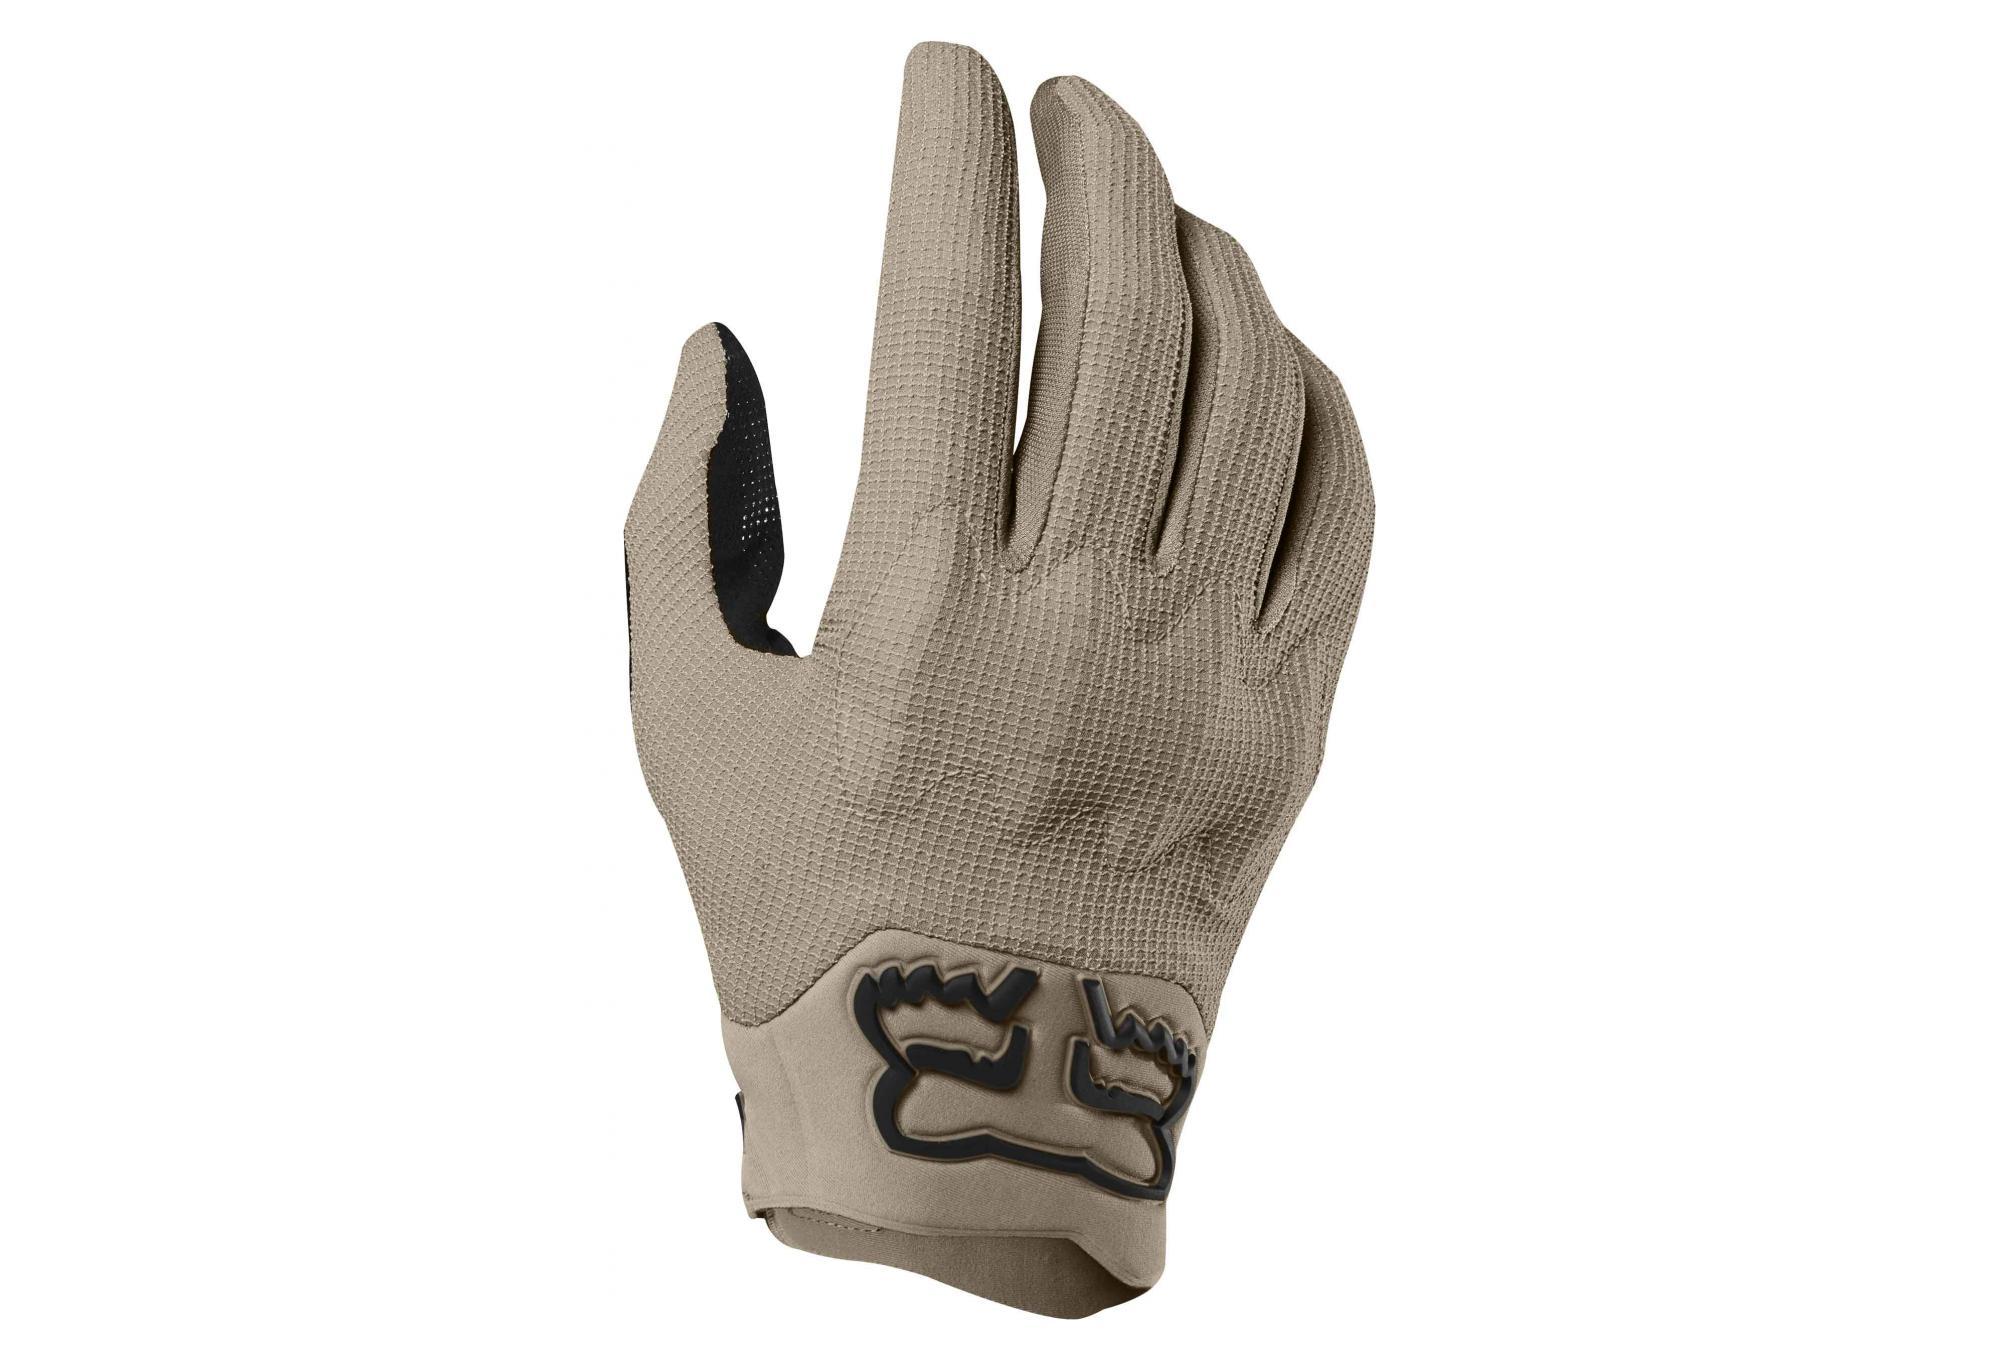 Fox Defend Kevlar D3O Long Glove Beige